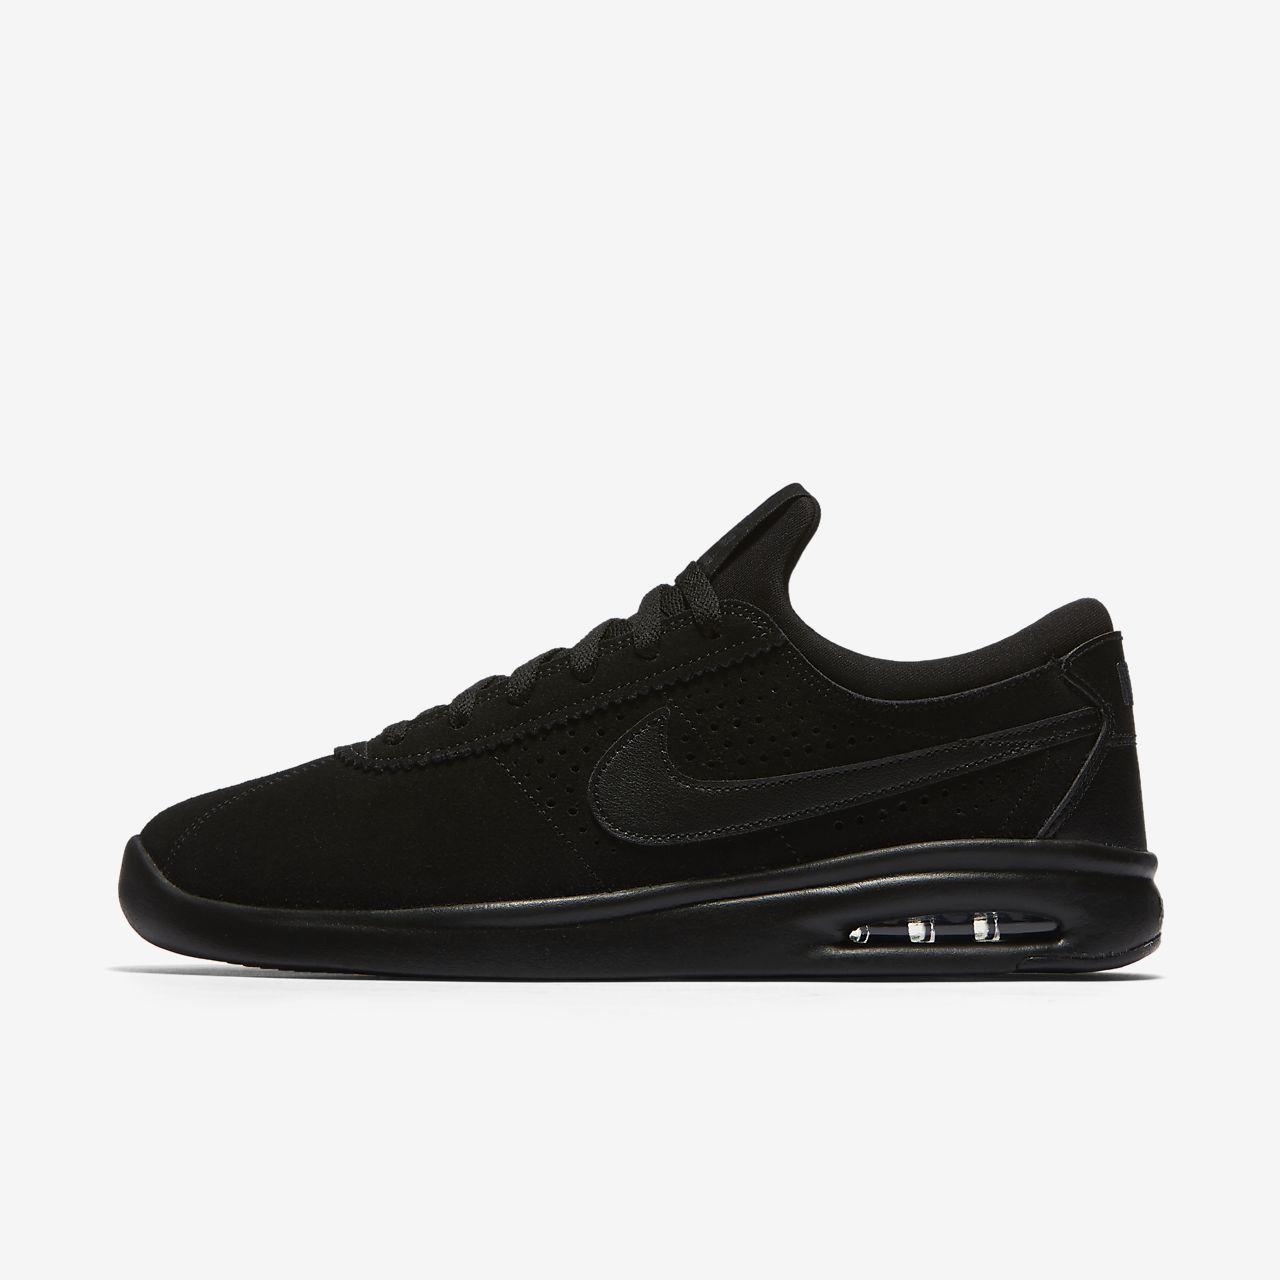 Chaussures Nike Dunk noires Skater homme bLV0HB0